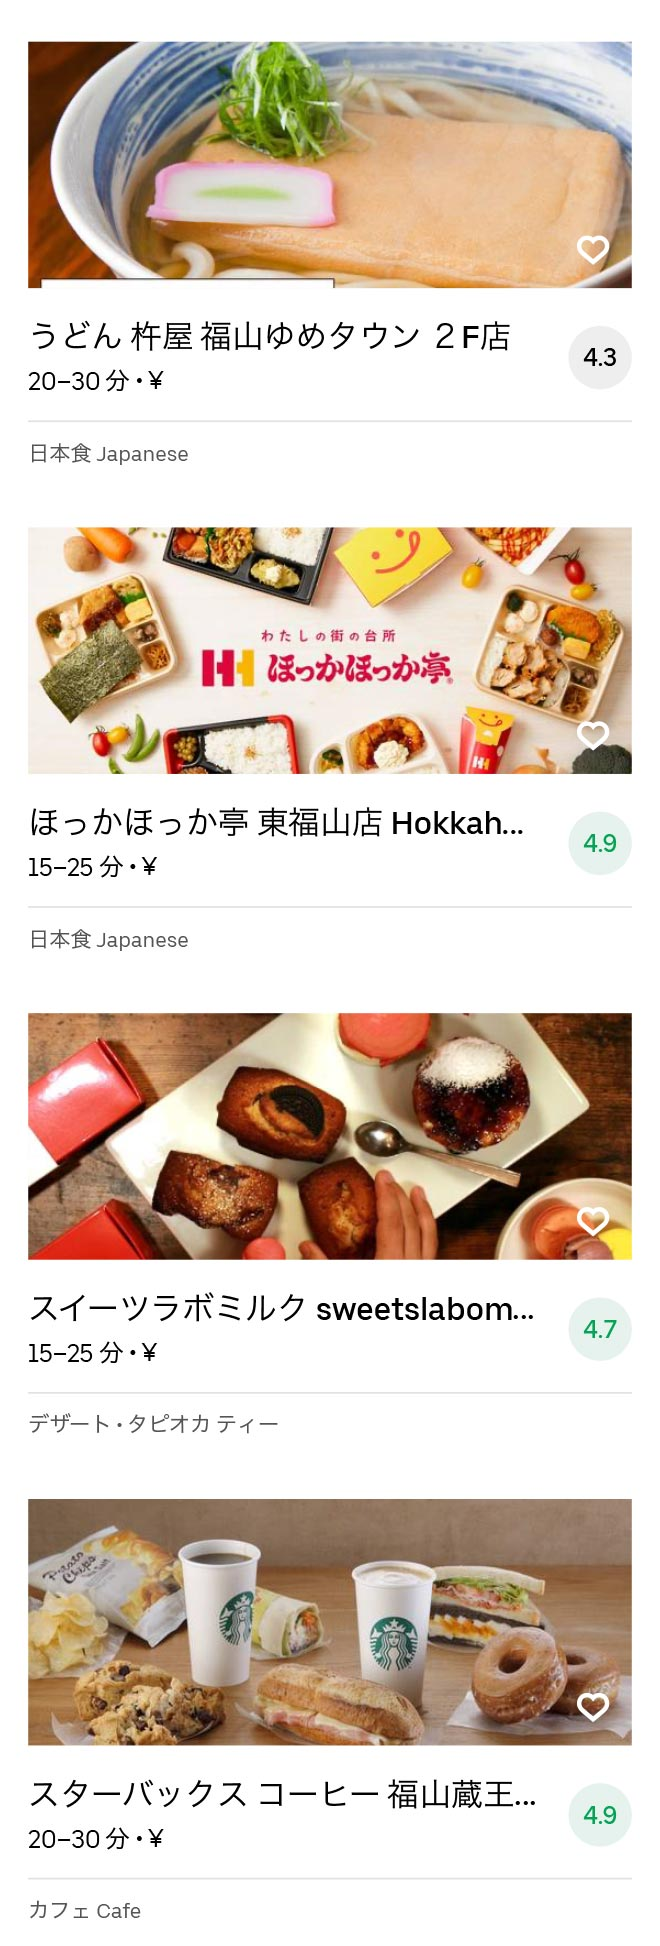 Higashi fukuyama menu 2010 04